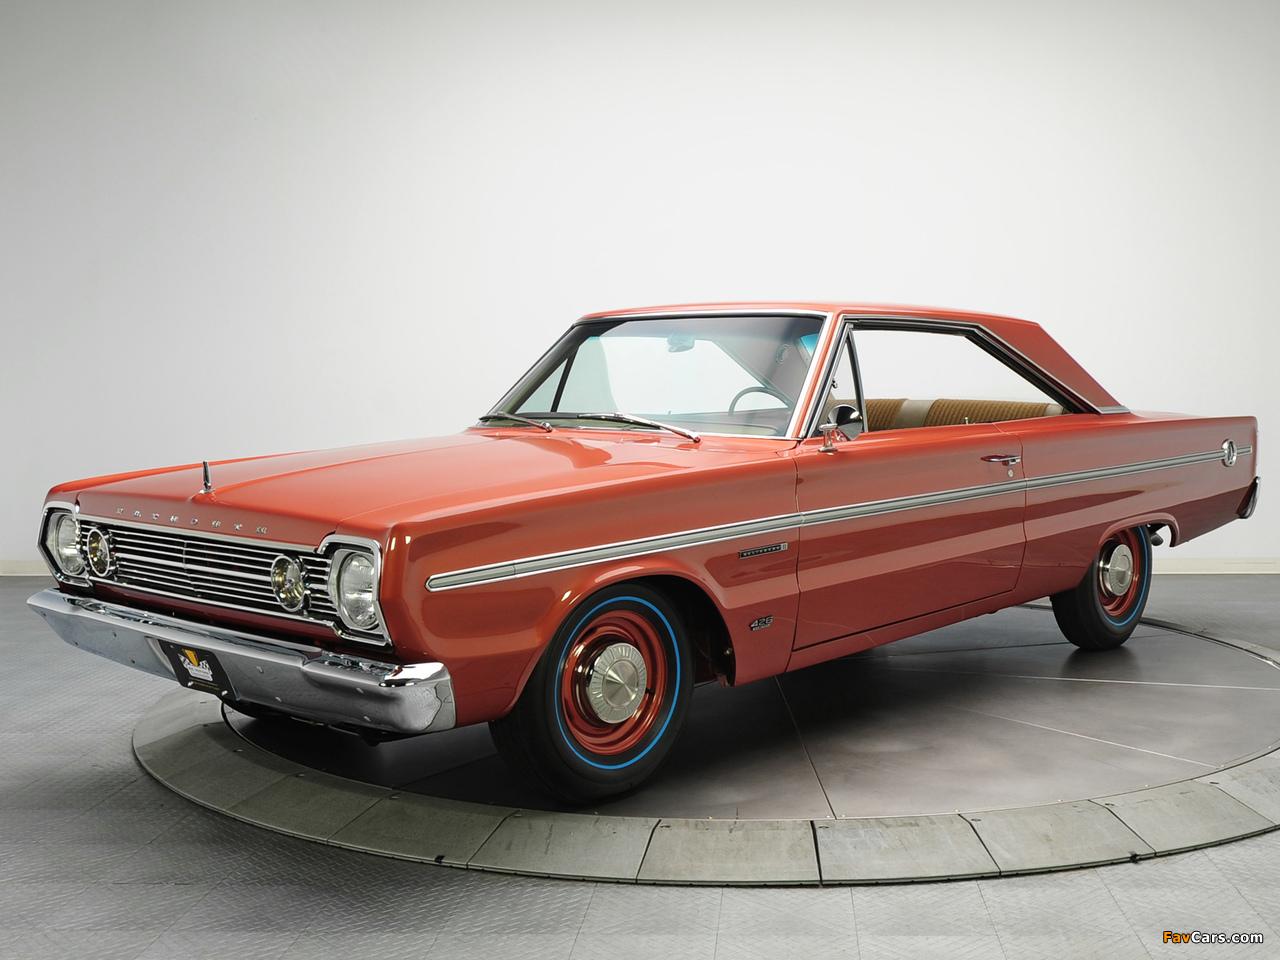 Images of Plymouth Belvedere II 426 Hemi Hardtop Coupe (RH23) 1966 (1280 x 960)